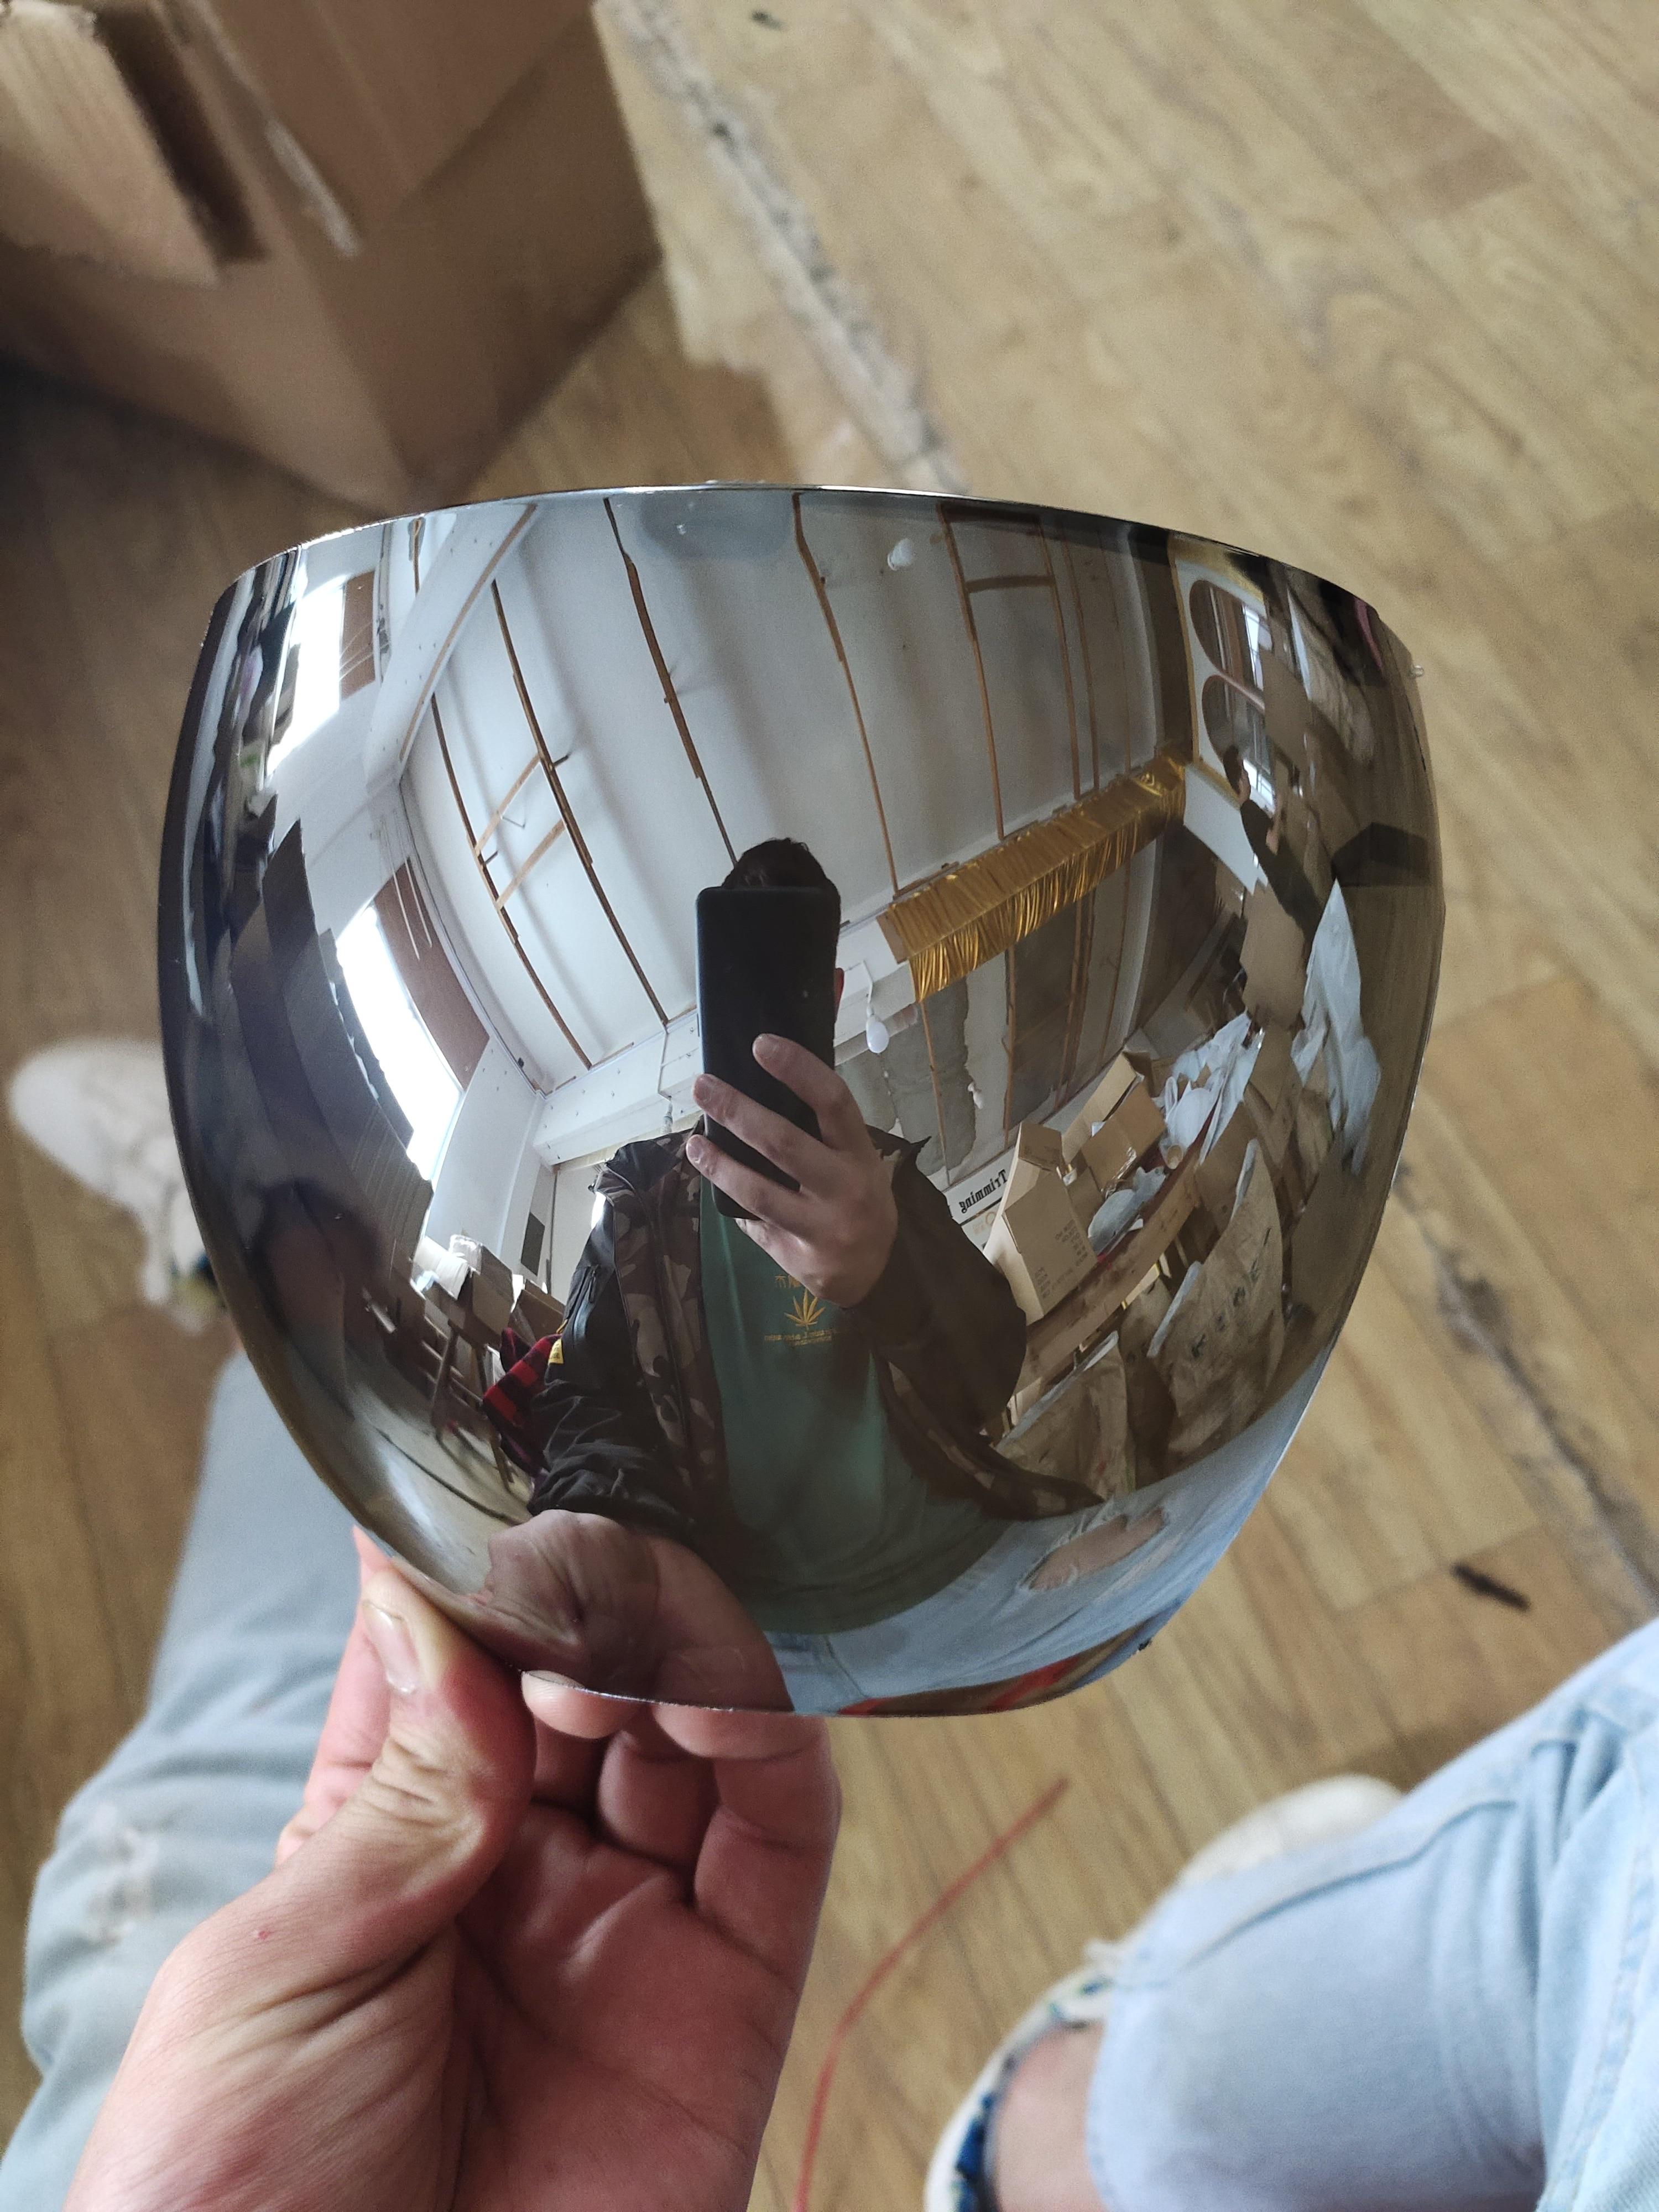 AliExpress - 1Pcs Silver Full Face Shield Unisex Oversize Shield Visor Sunglasses Plastic Sun Glasses for Men and Women Dropshipping